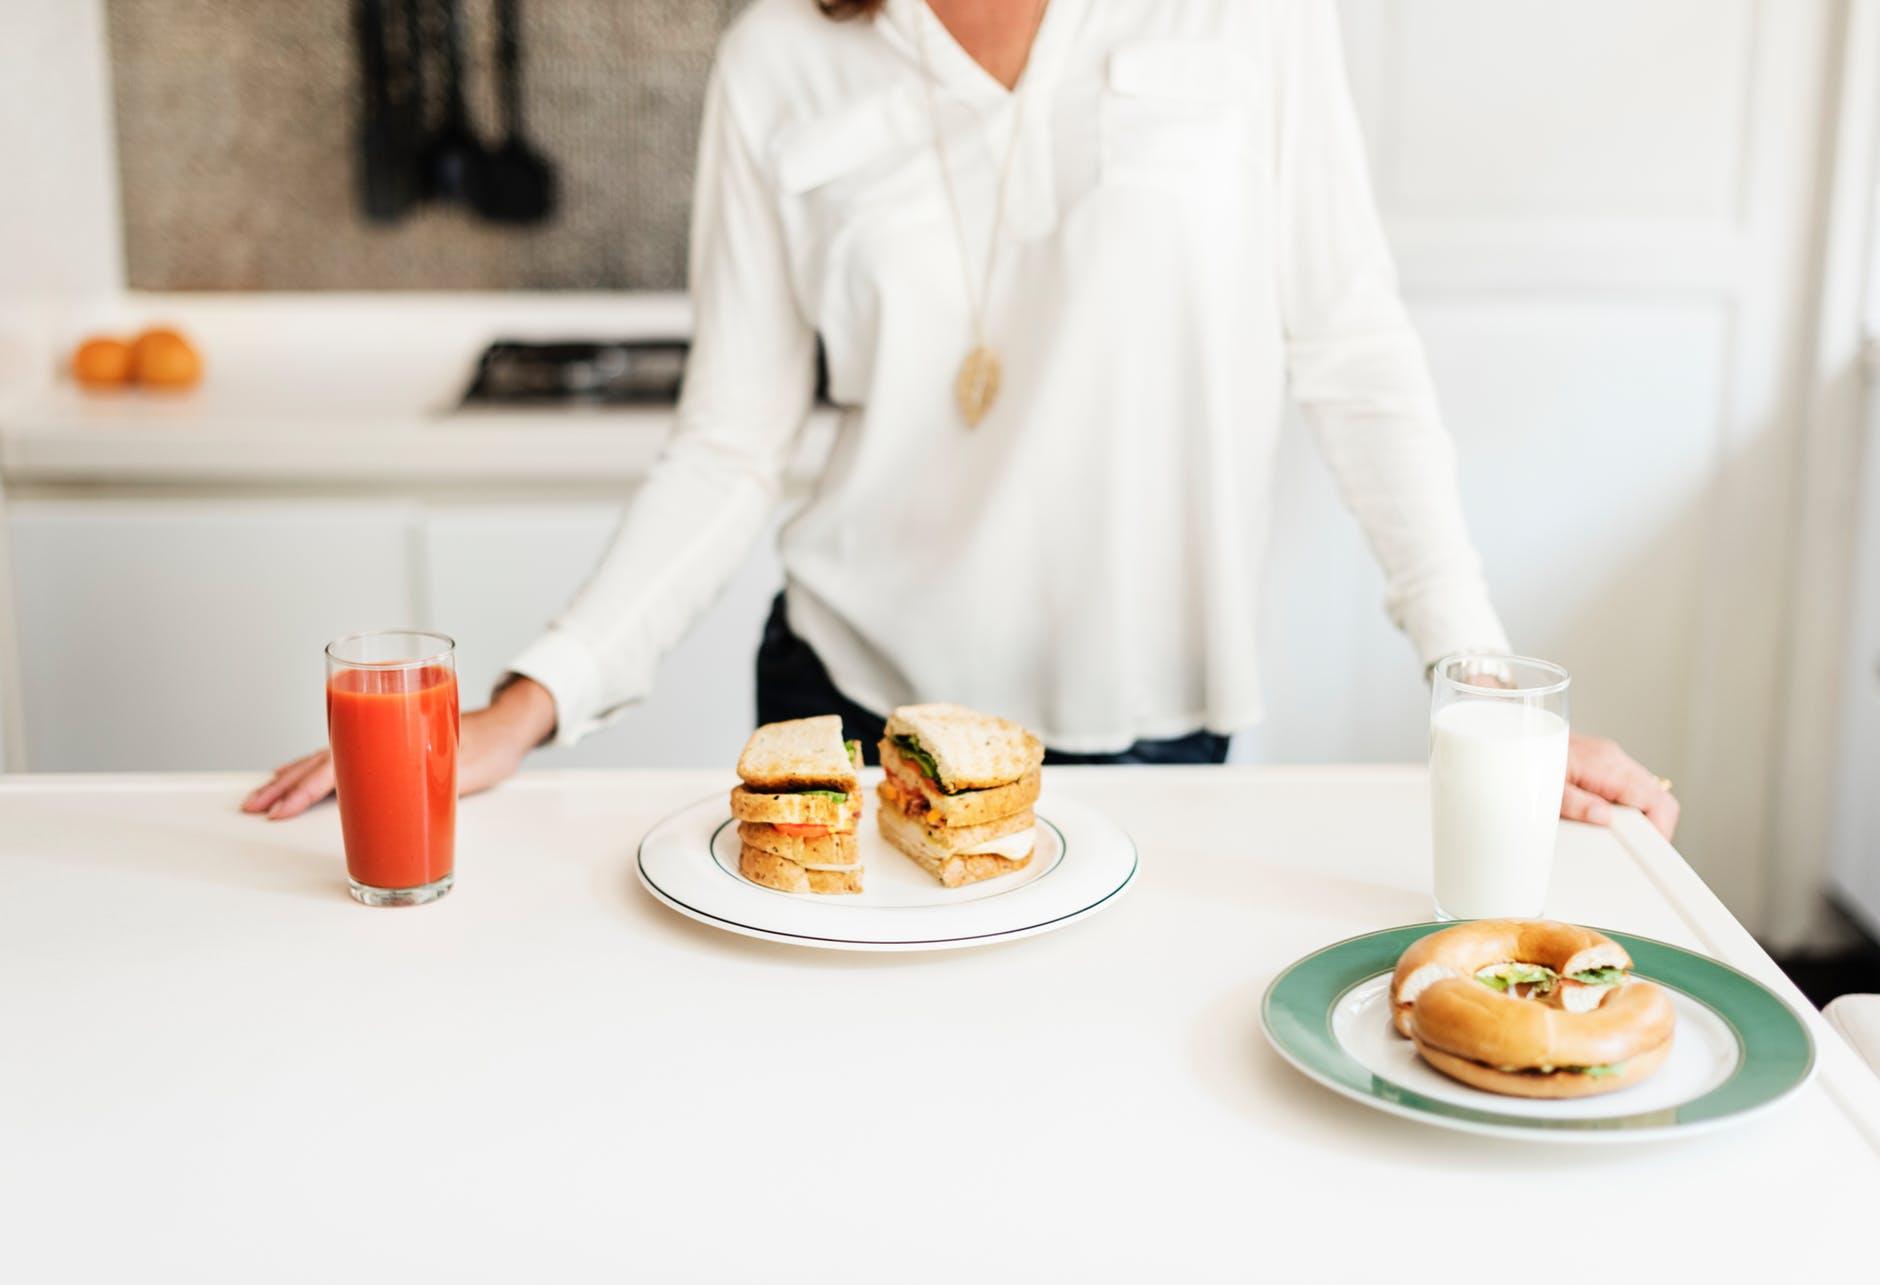 hrana dorucak prehrana sok mlijeko sendvic dijeta mrsavljenje kilogram